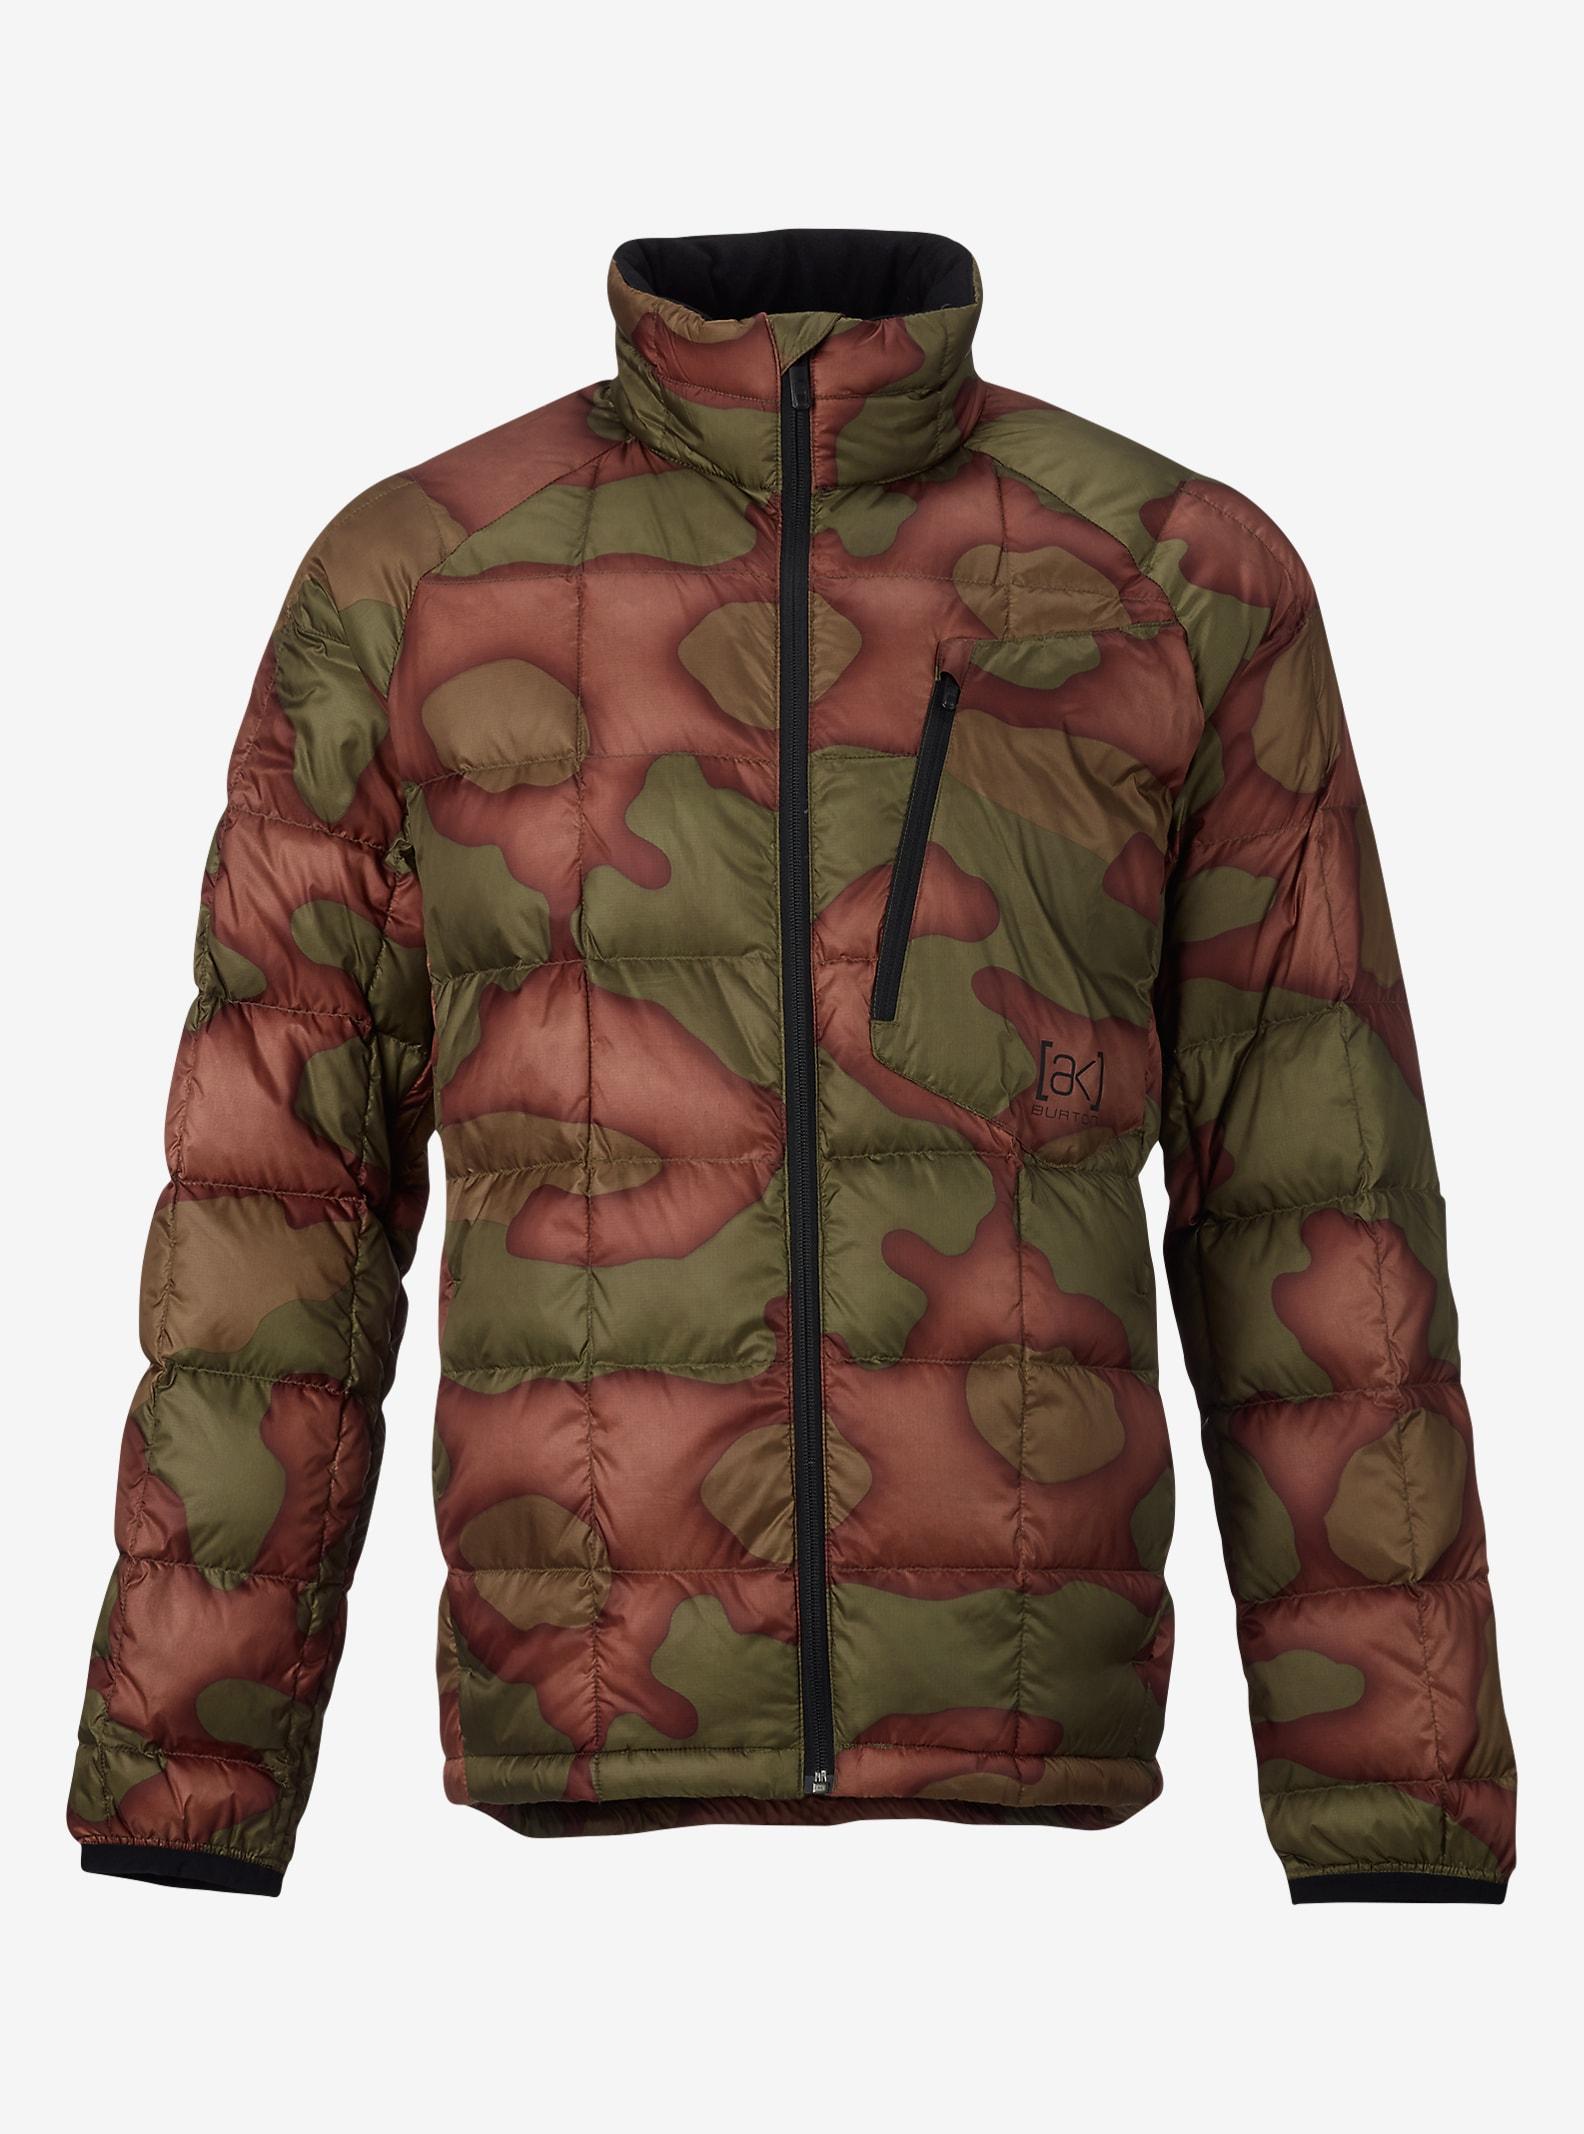 Burton [ak] BK Down Insulator Jacket shown in Hombre Camo